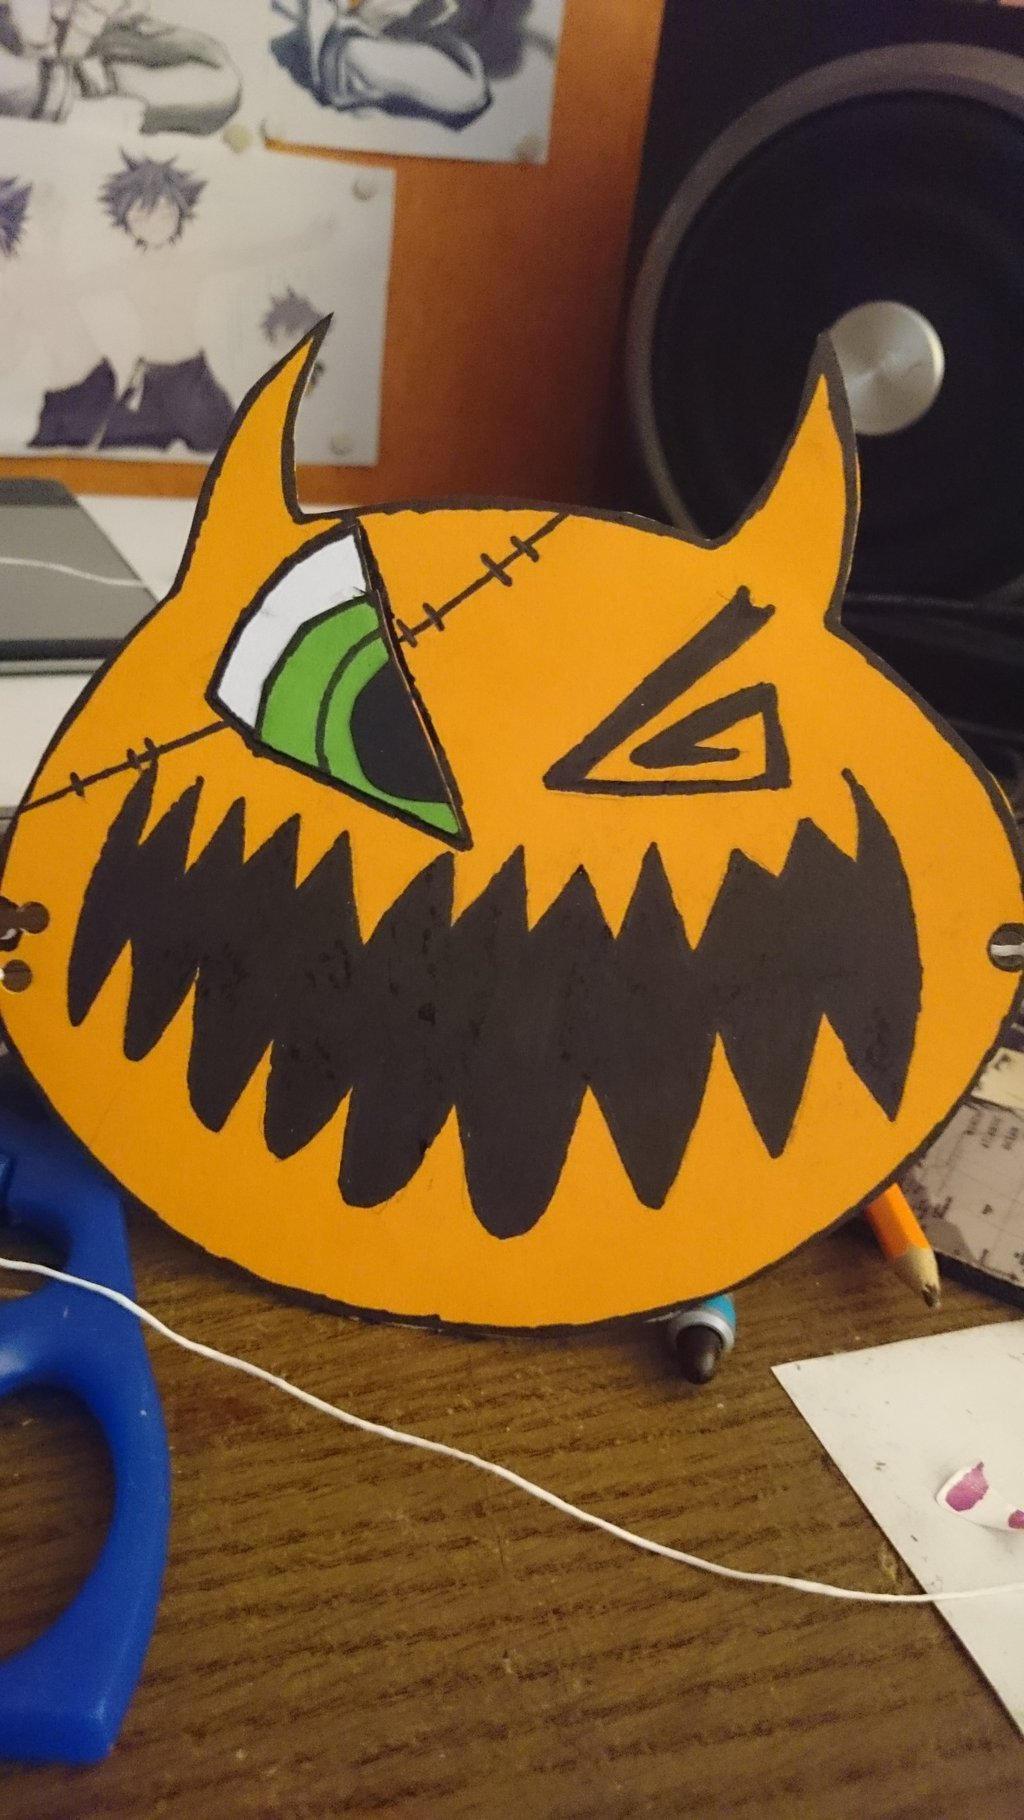 Halloweentown Sora's mask by DragonEmpress666 on DeviantArt